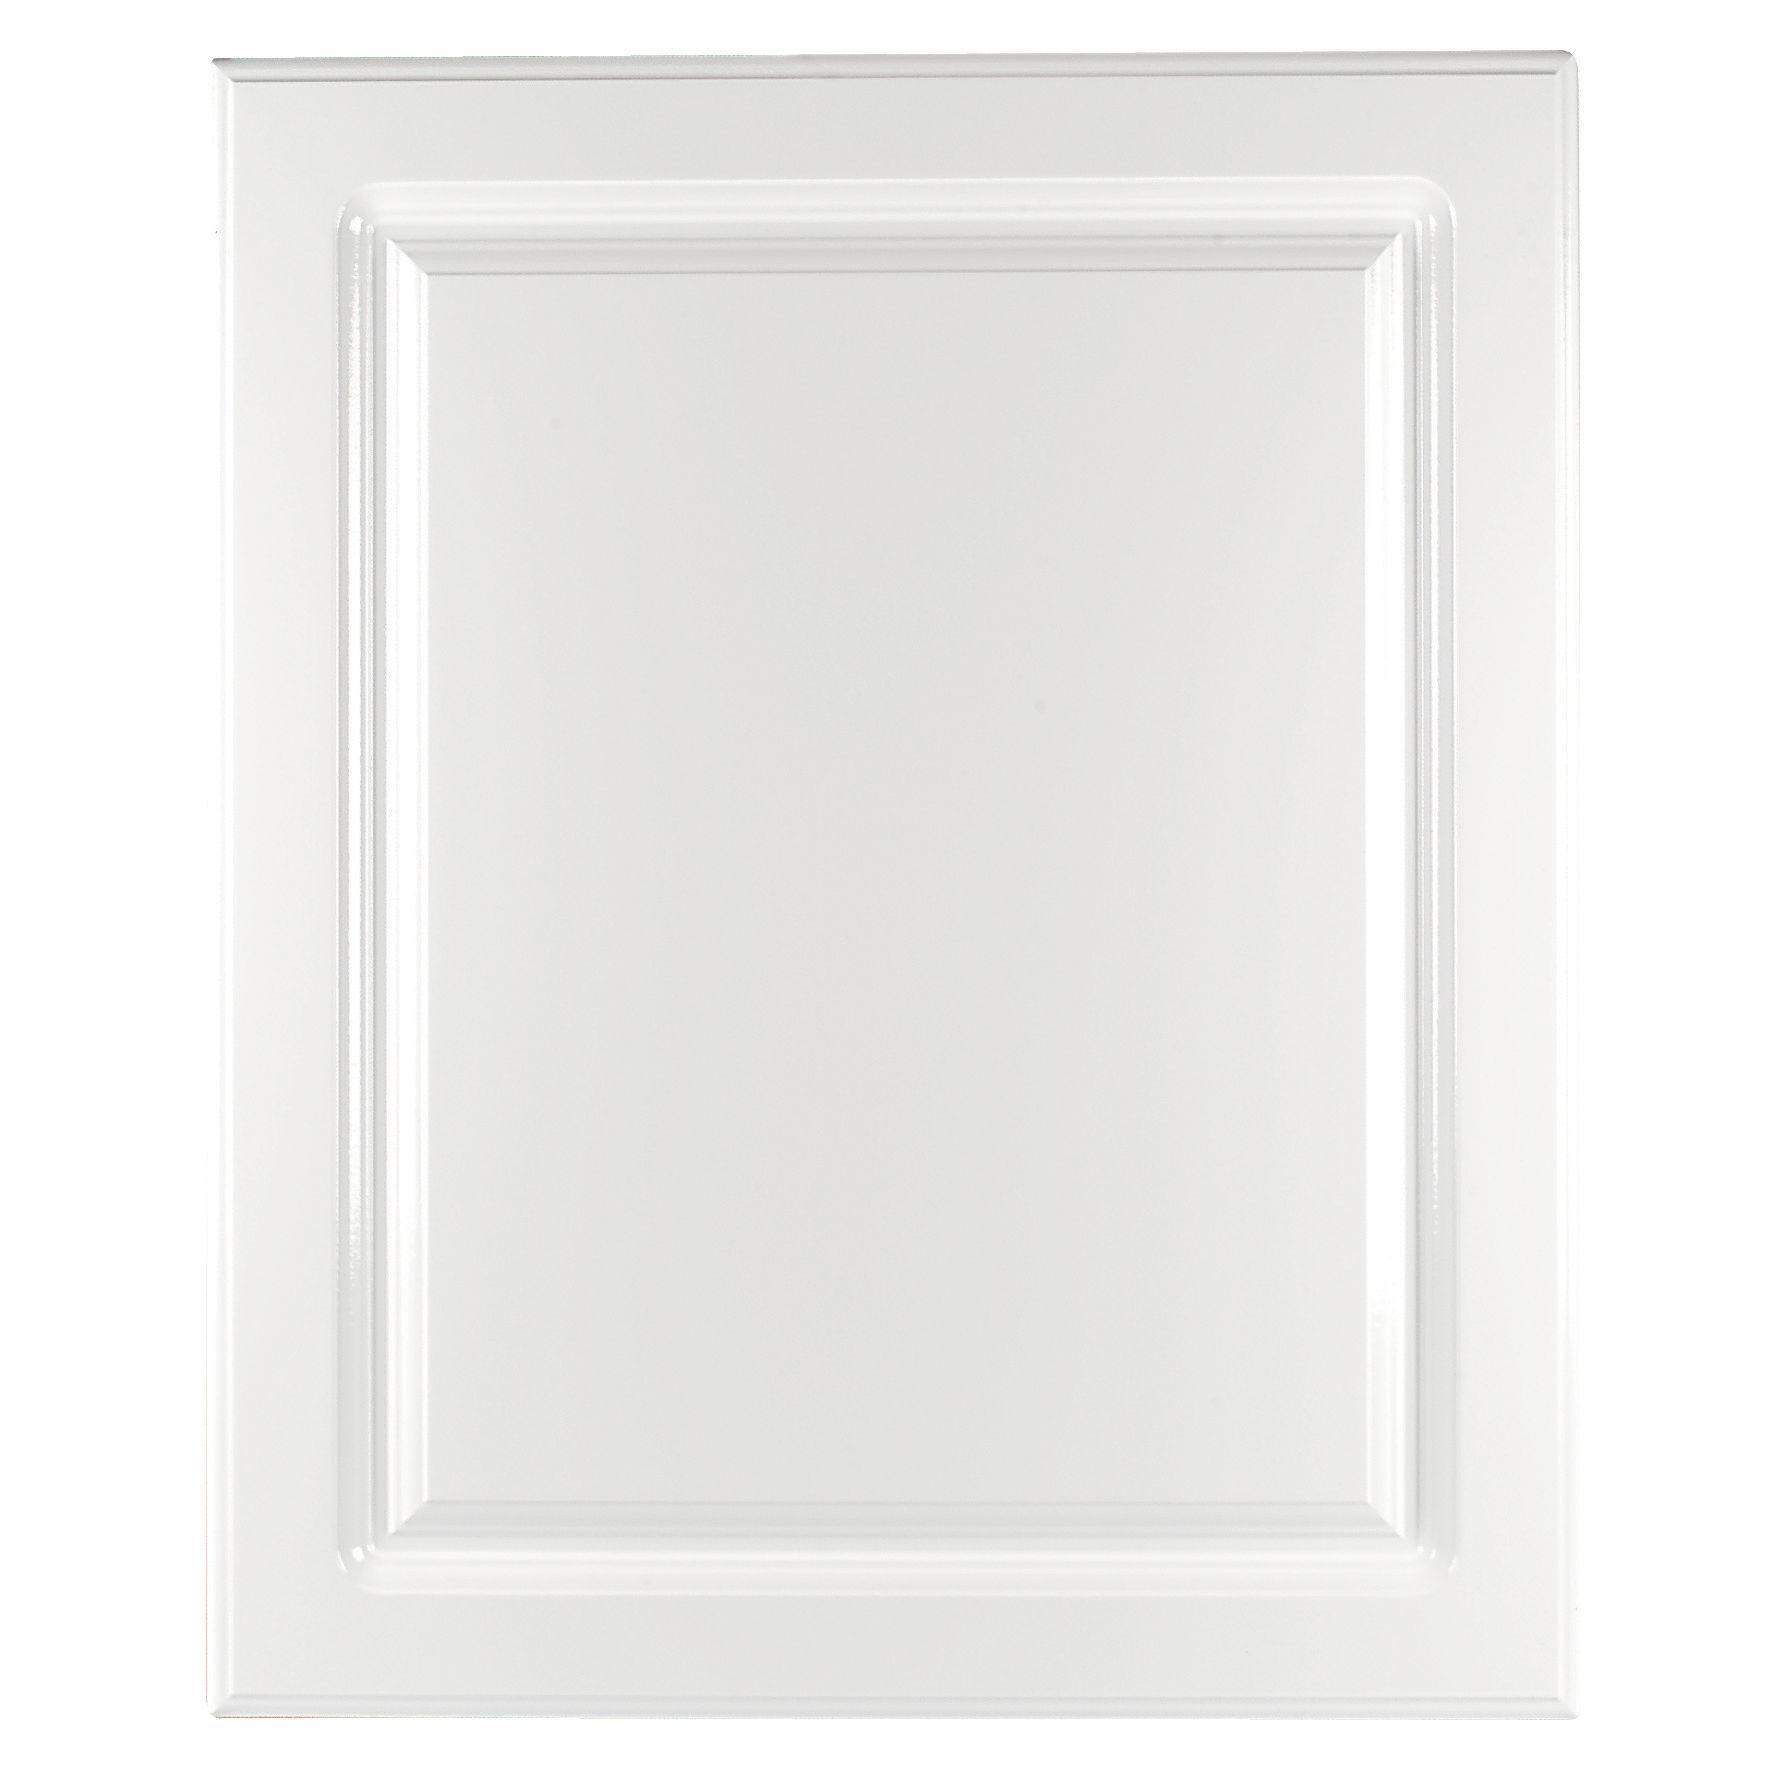 It kitchens chilton gloss white style standard door w for Kitchen bridging units 600mm